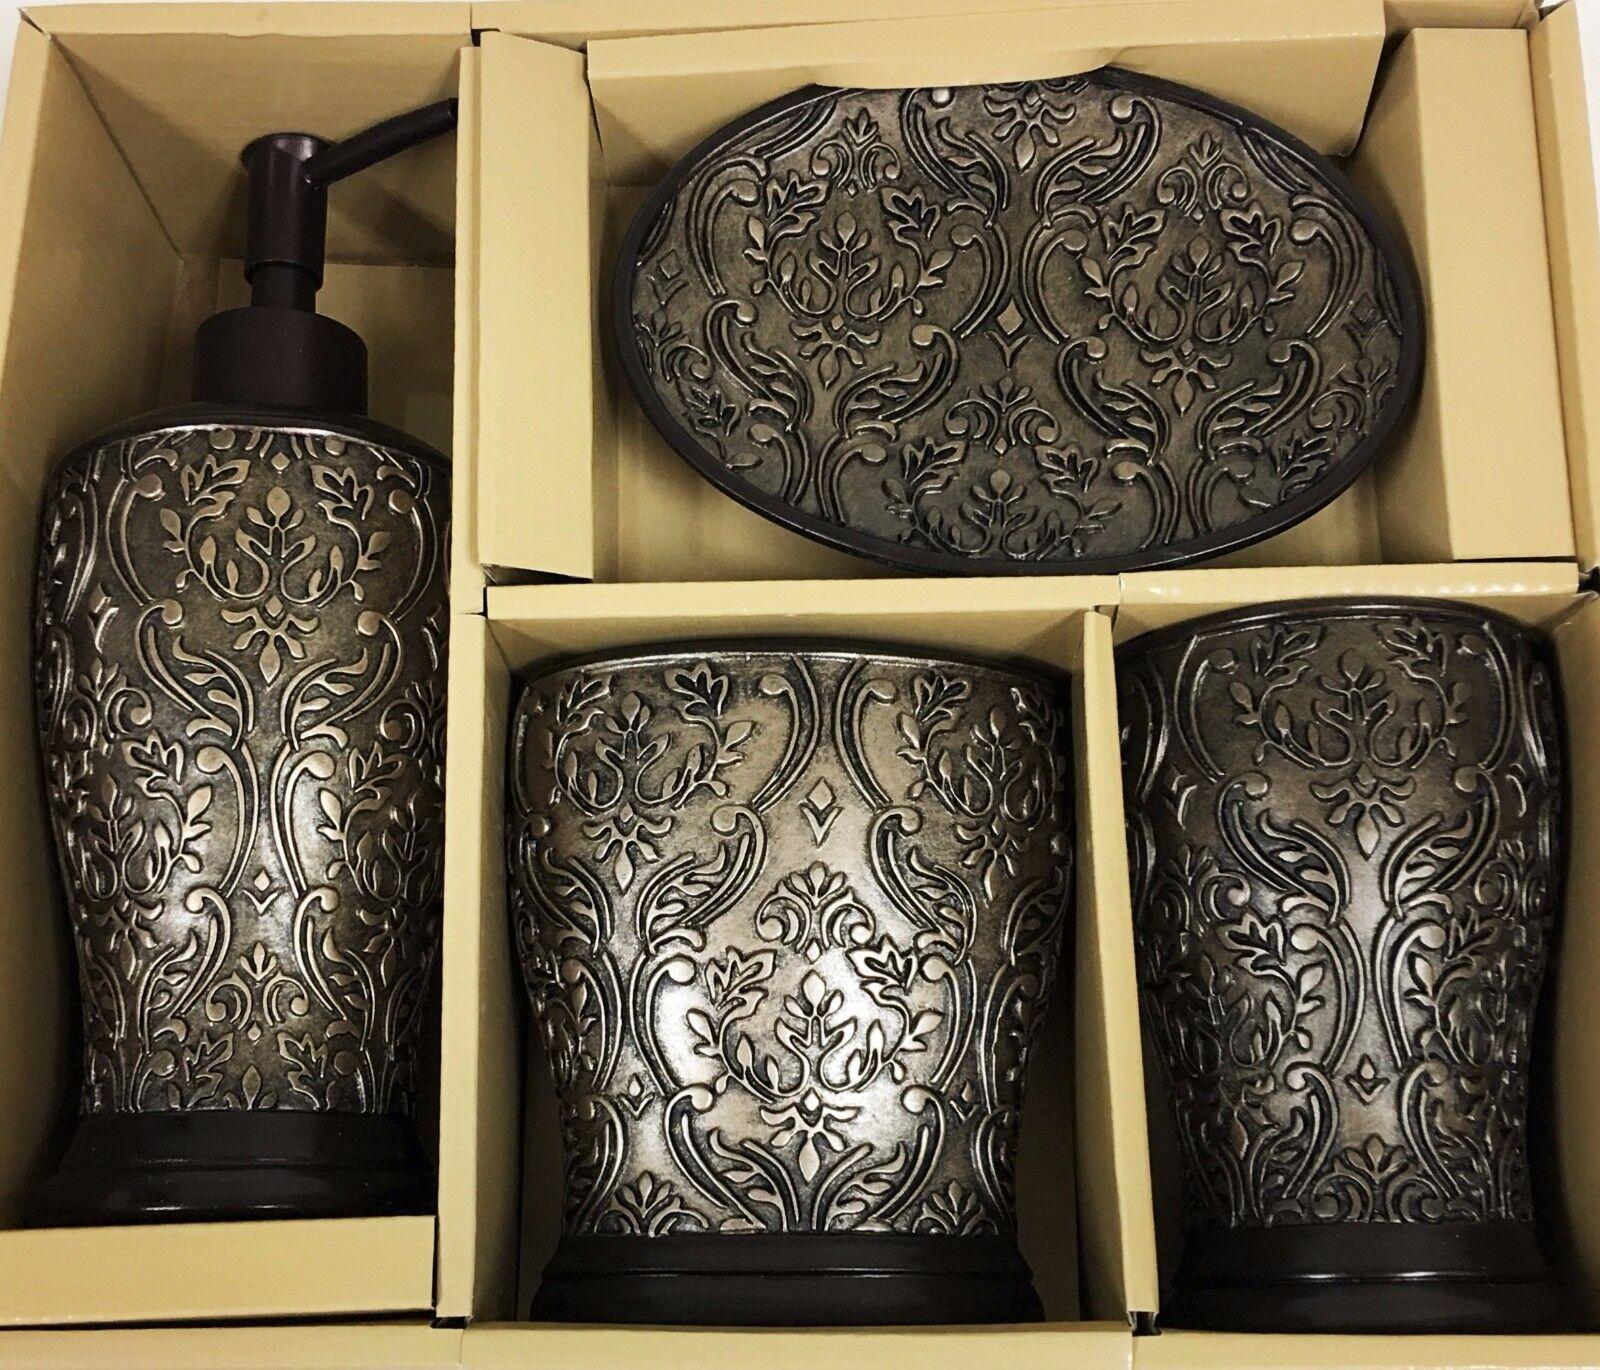 Neu 4 Stück Set aus Rotguss + Bronze Braun Braun Braun 3D Vintage Design Harz Seifenspender e7b7f8